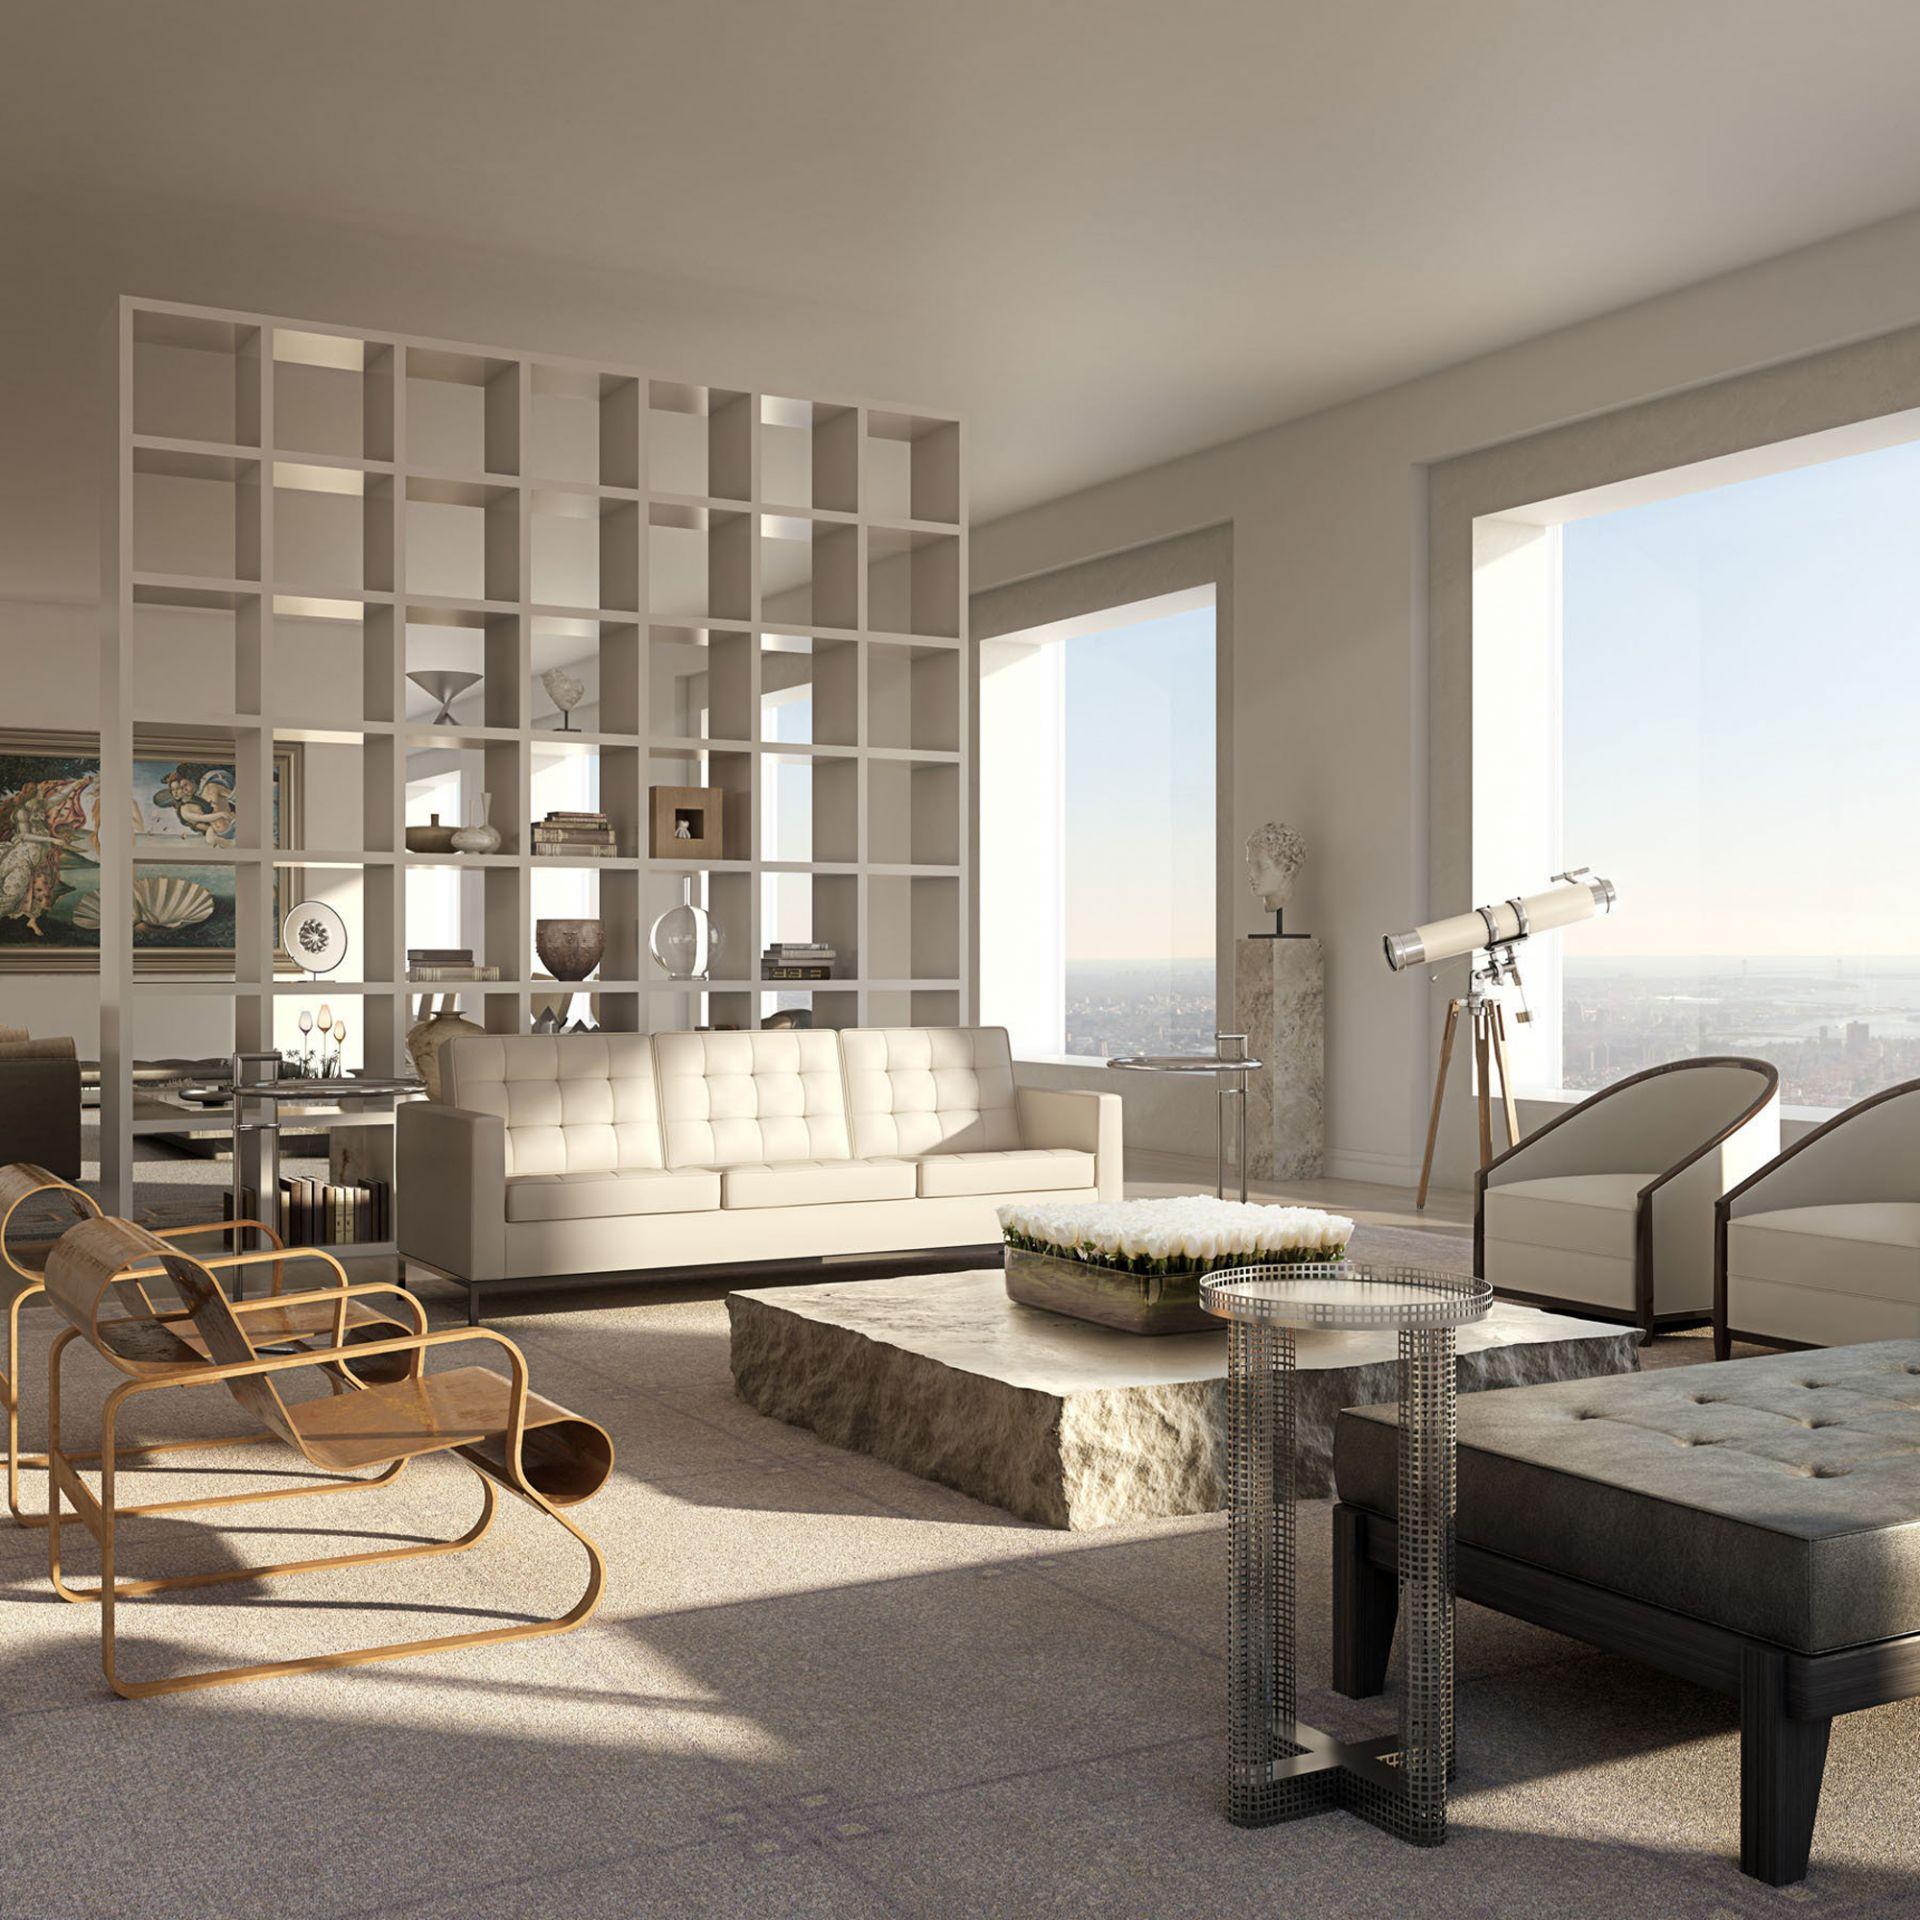 432 Park Avenue Interior Lounge